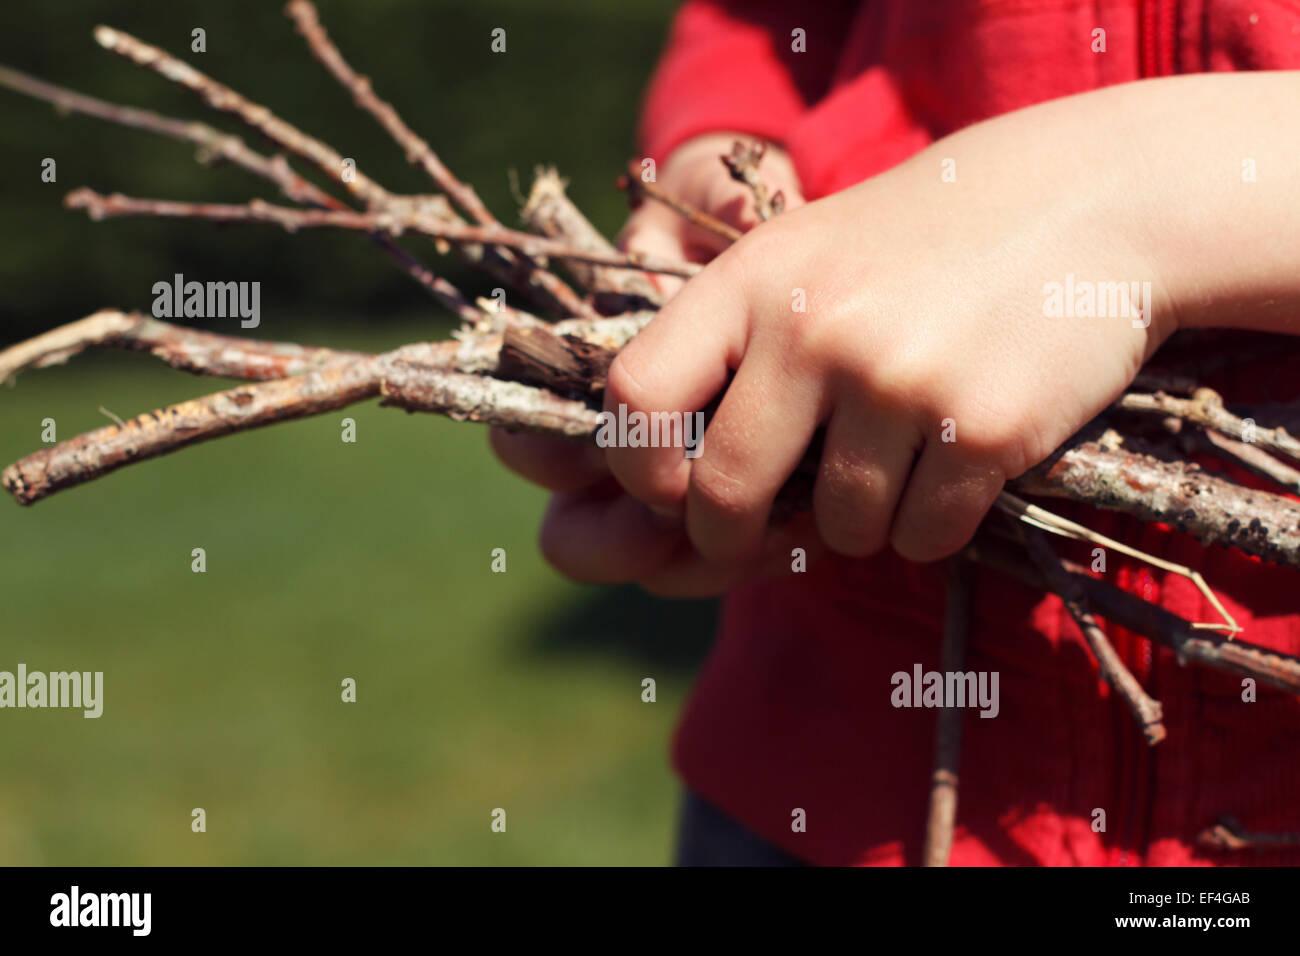 child holding wooden sticks close up - Stock Image